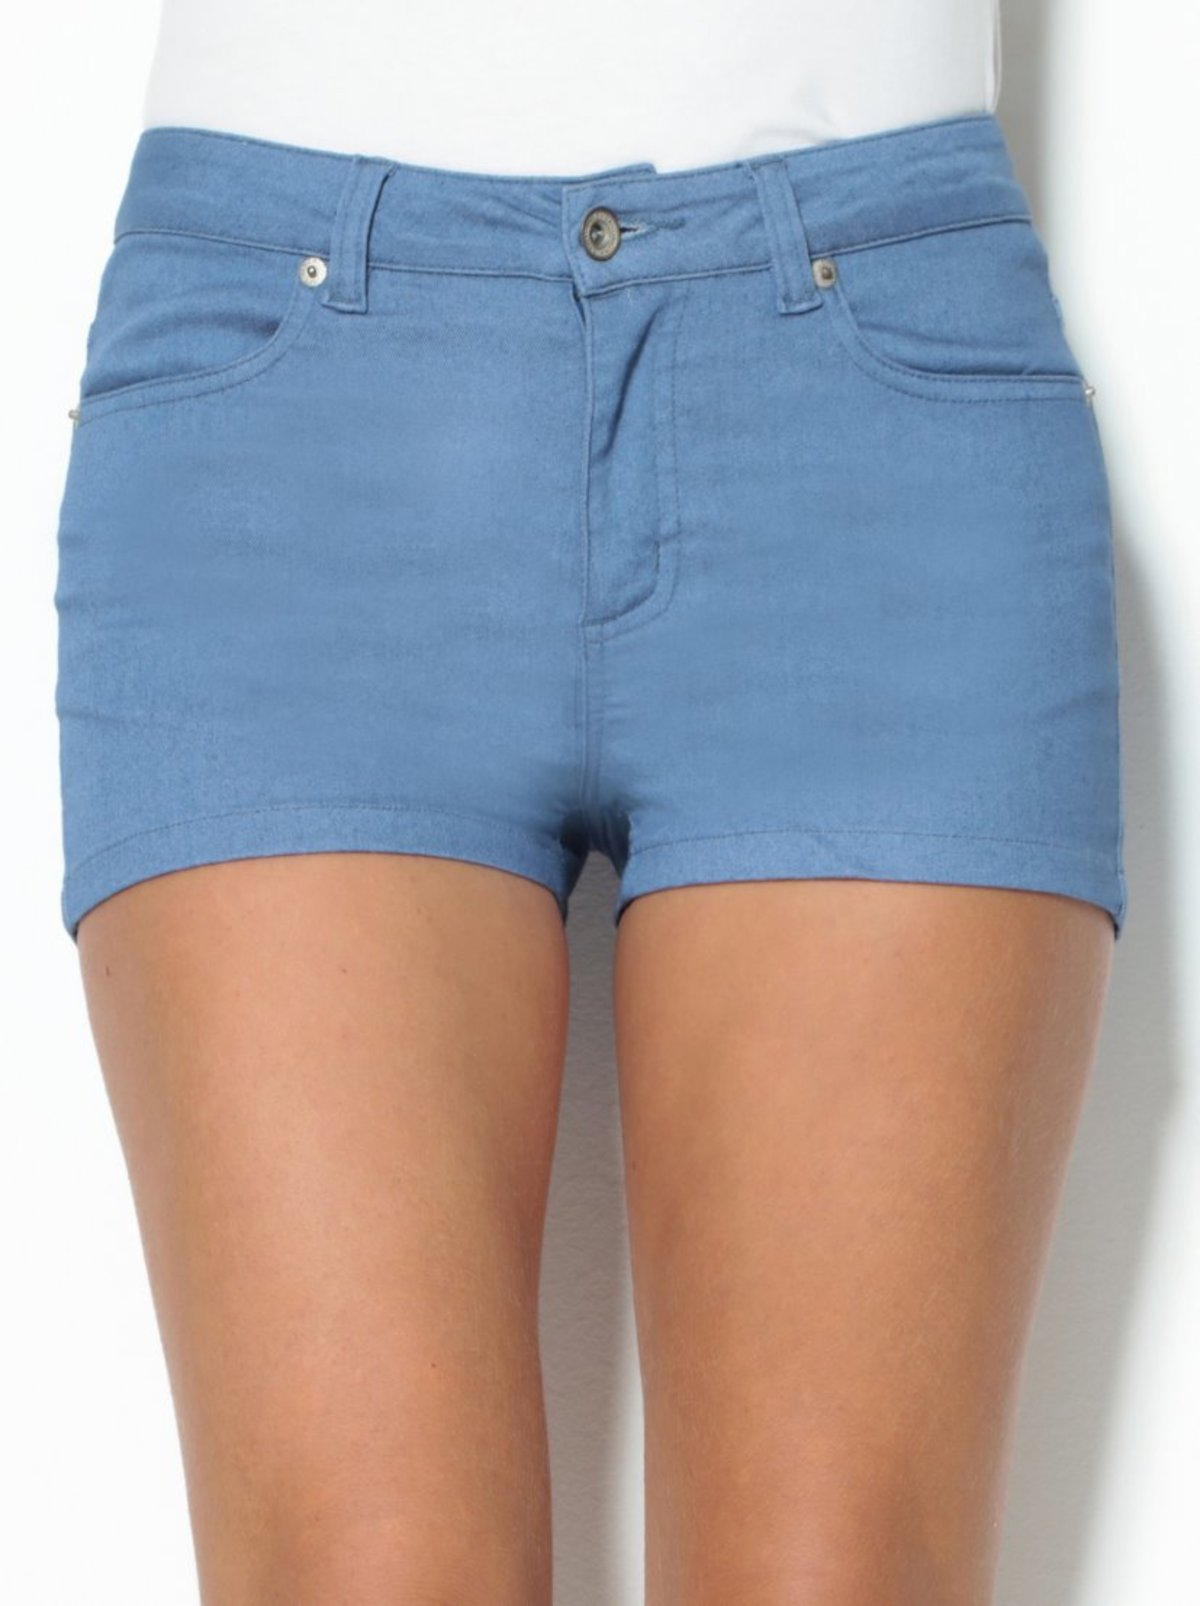 Pantalon Corto Short Mujer De Tiro Medio Con Bolsillos